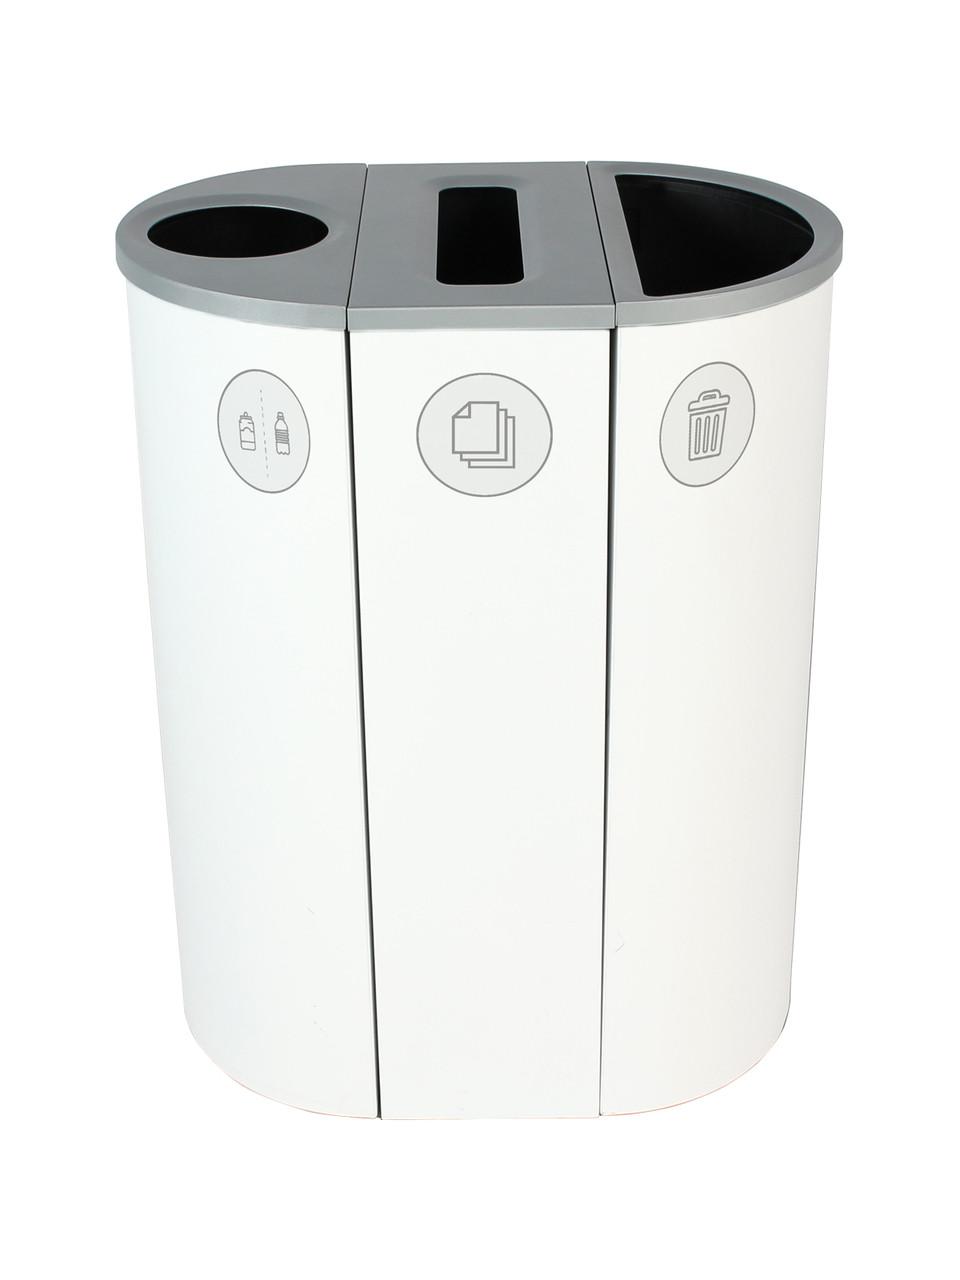 26 Gallon Spectrum Triple Recycling Station White 8107115-134